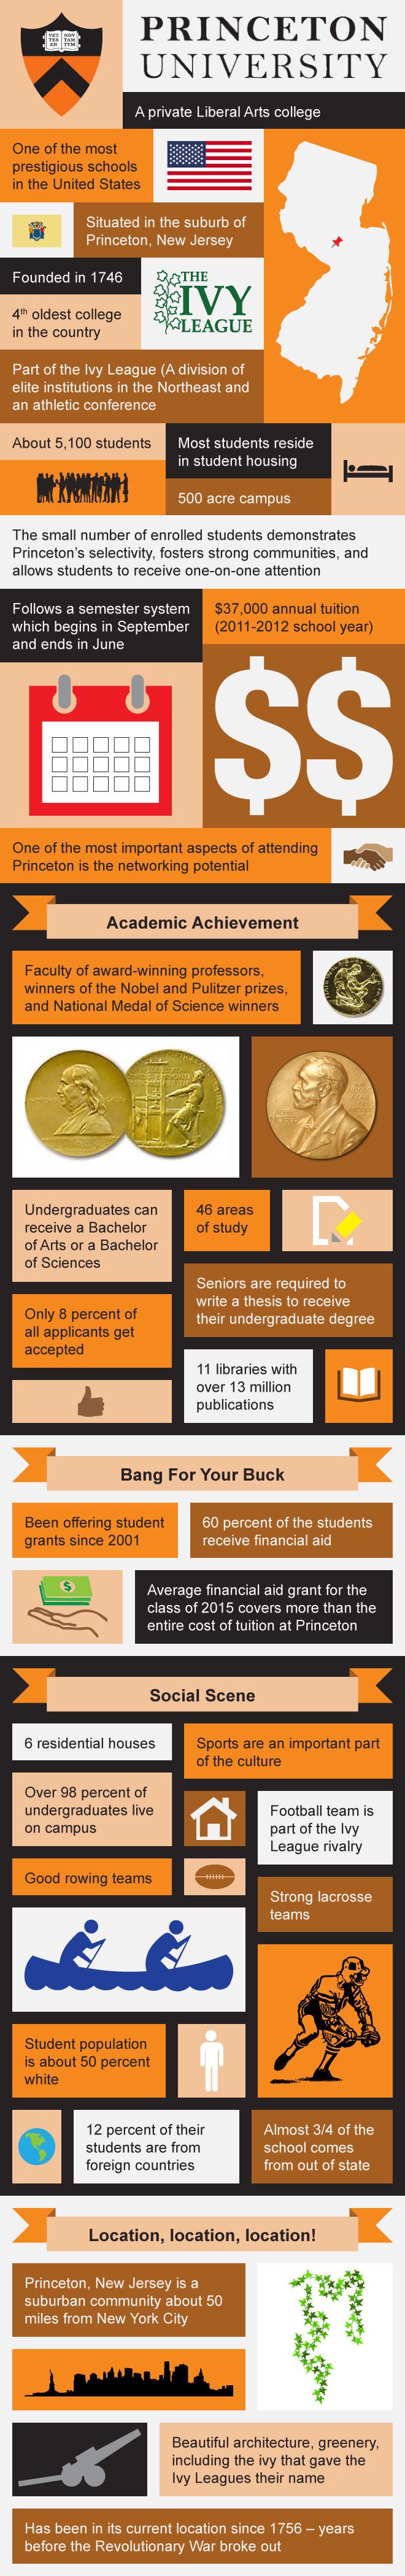 Princeton University Infographic Us Universities Princeton University University Ivy League Schools